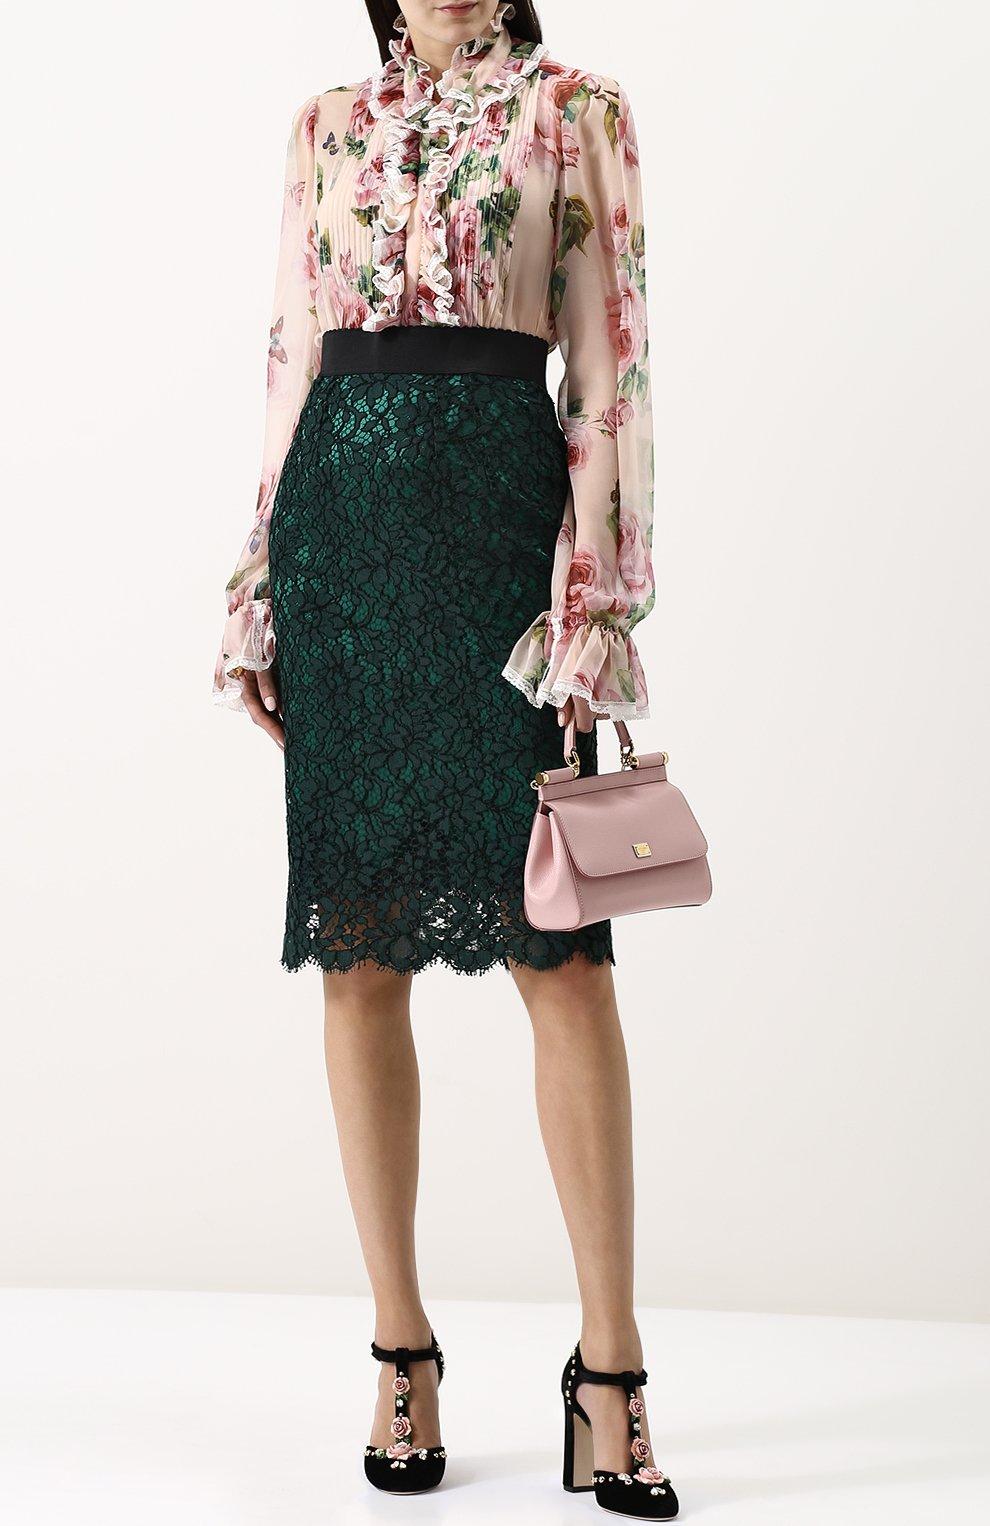 Кружевная юбка-миди с широким поясом | Фото №2